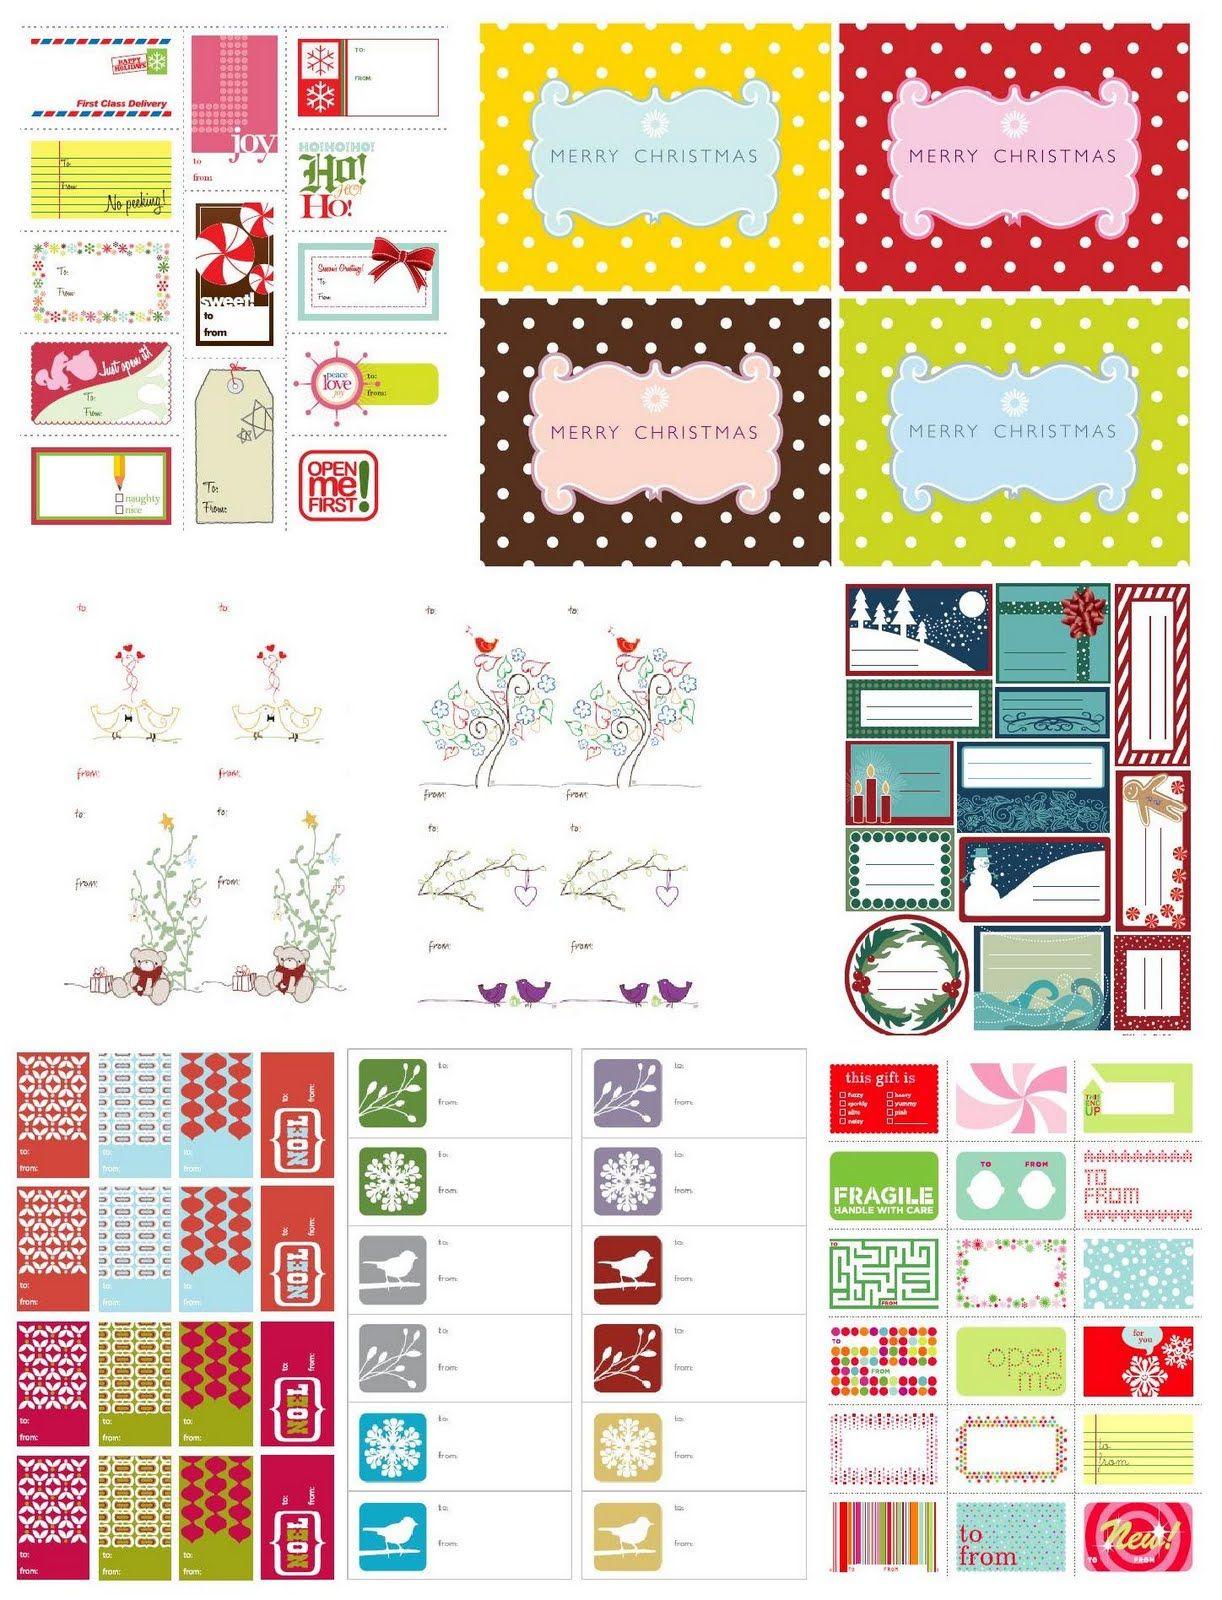 free printable christmas tags | Art and crafts | Pinterest ...